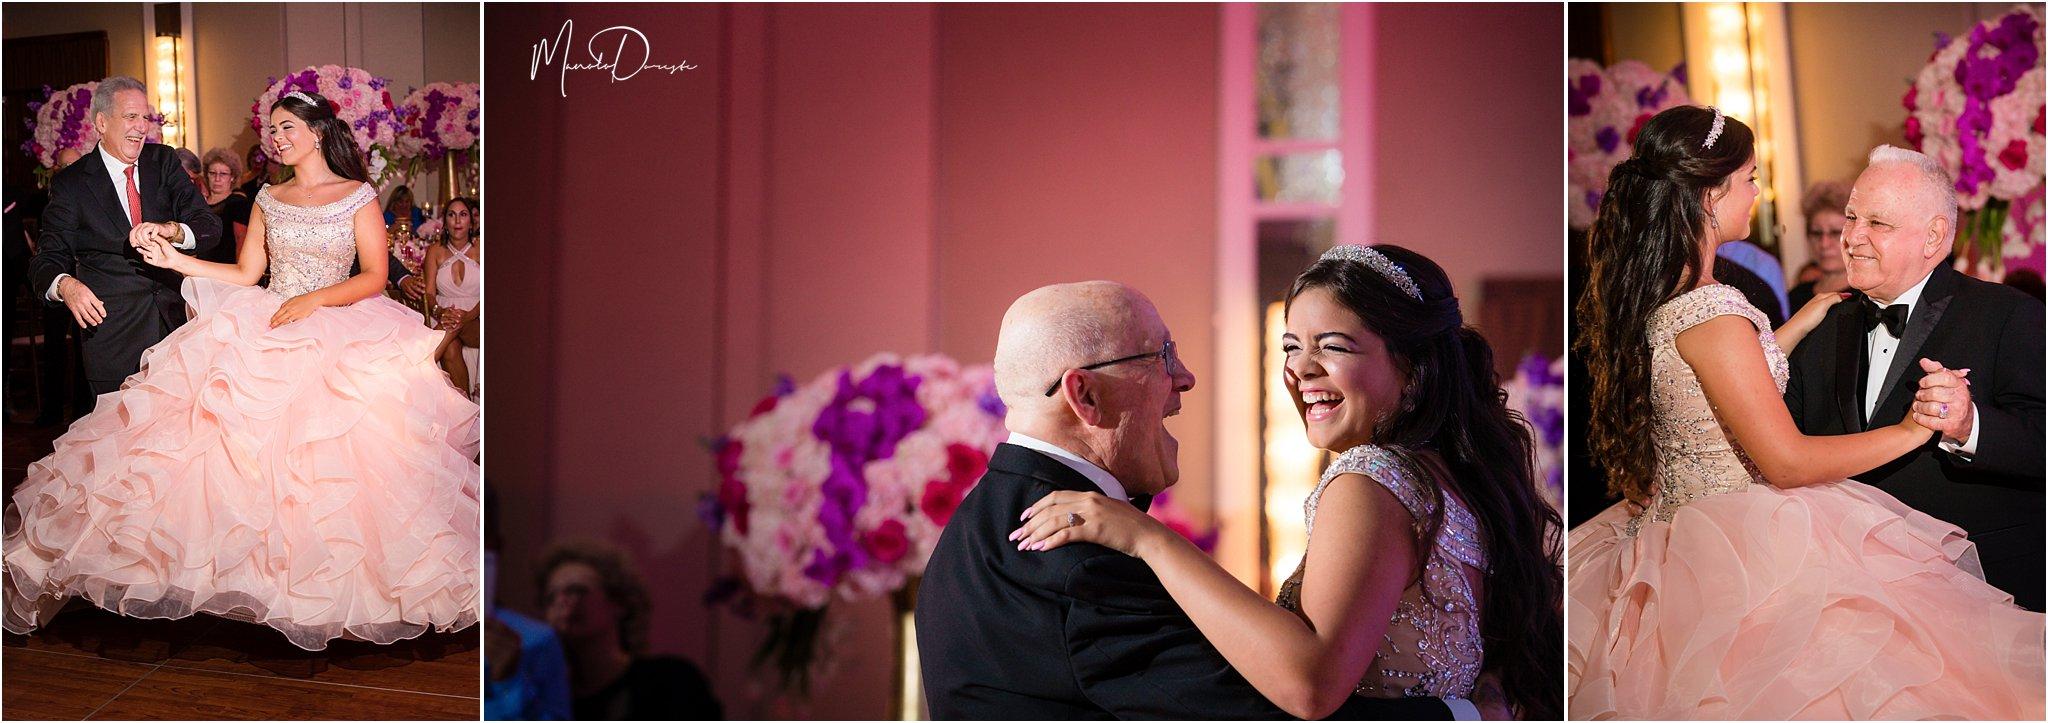 0286_ManoloDoreste_InFocusStudios_Wedding_Family_Photography_Miami_MiamiPhotographer.jpg